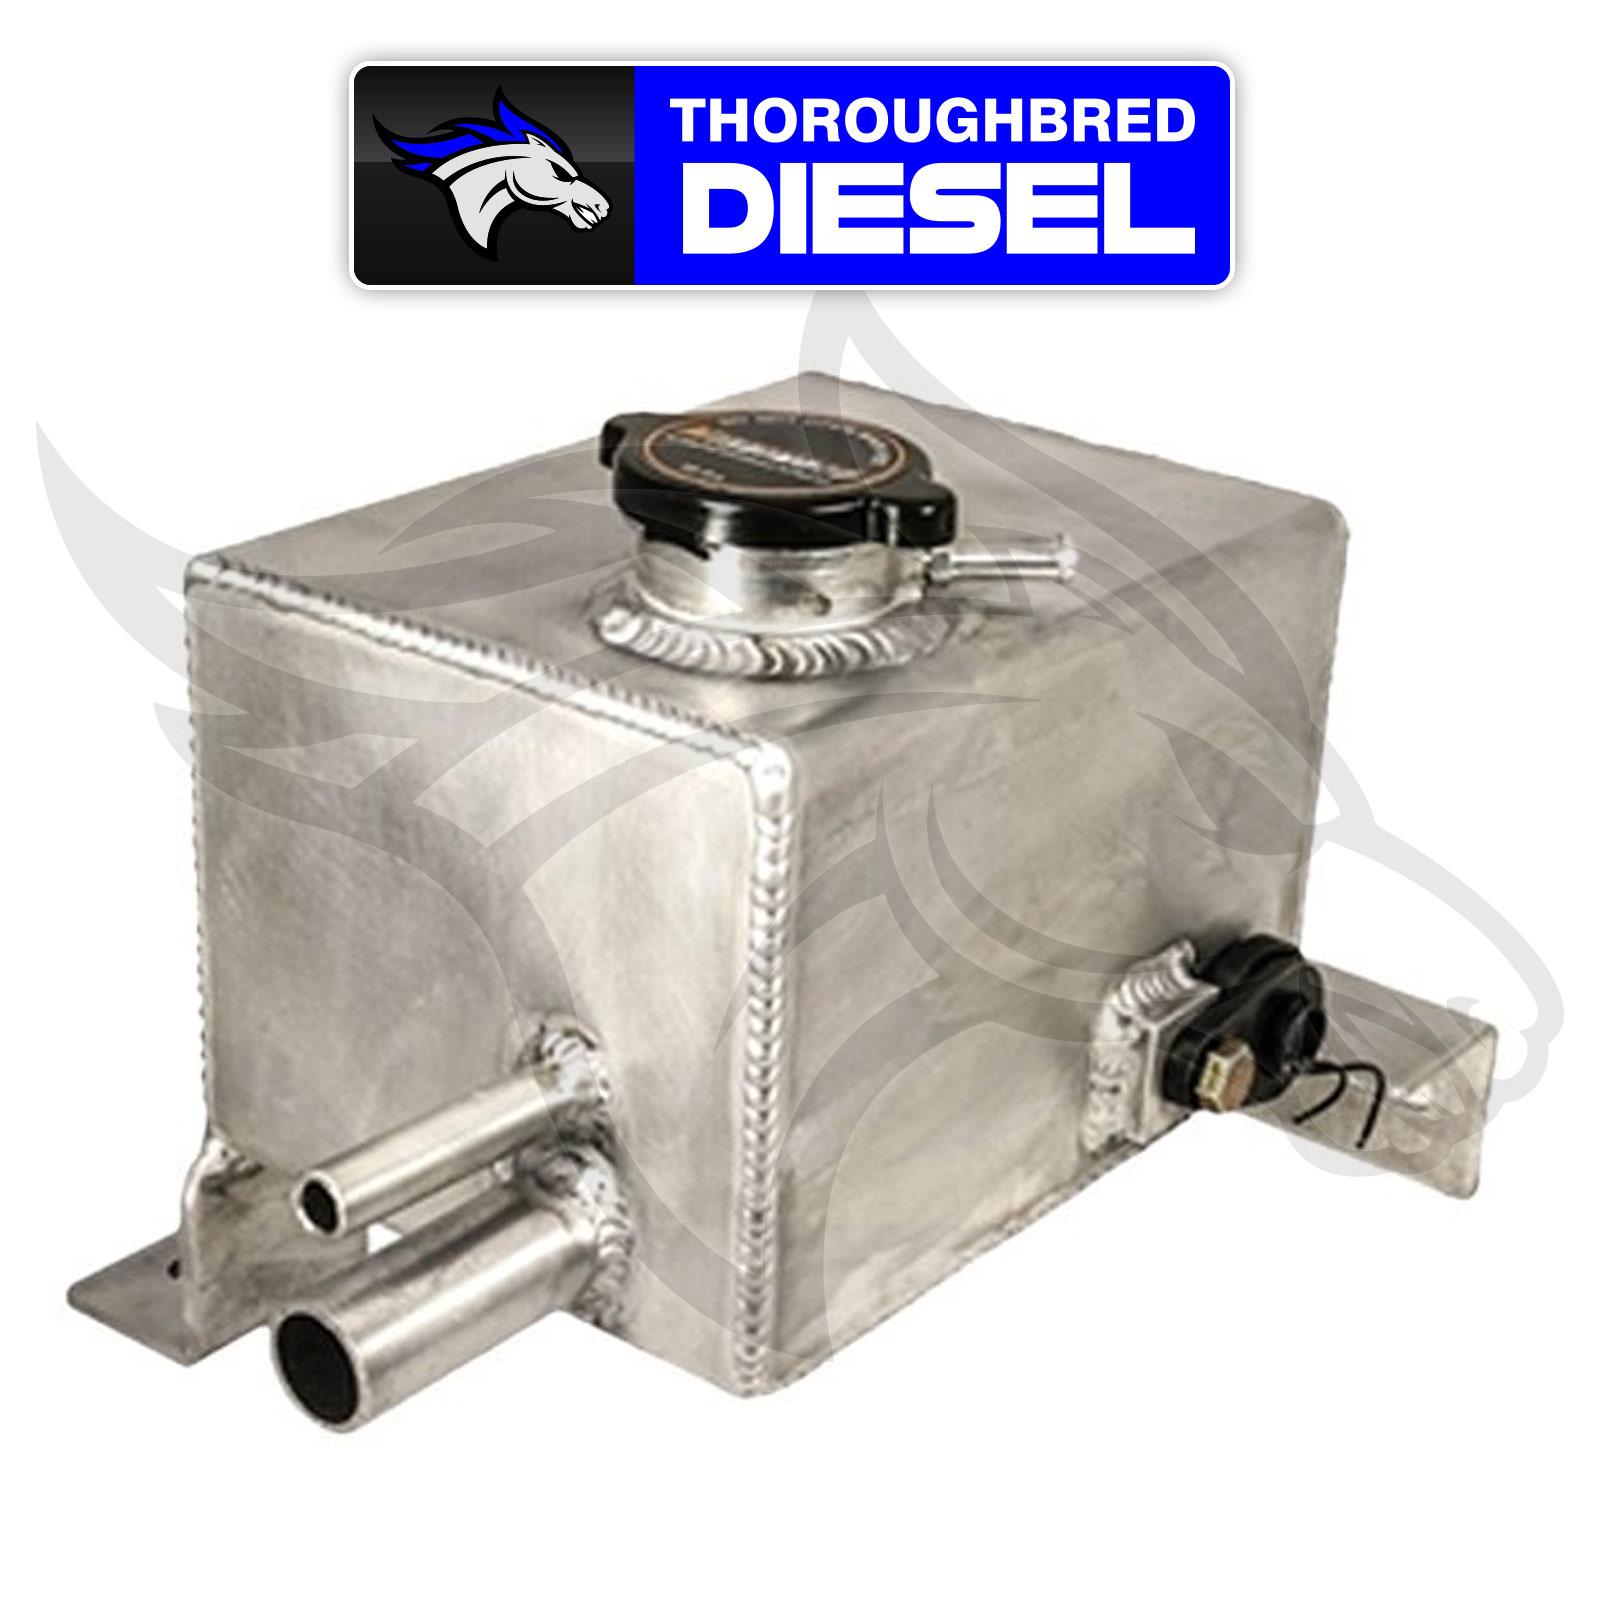 Deviant Race Parts Billet Resonator Delete Plug for 04-10 Duramax; 76130